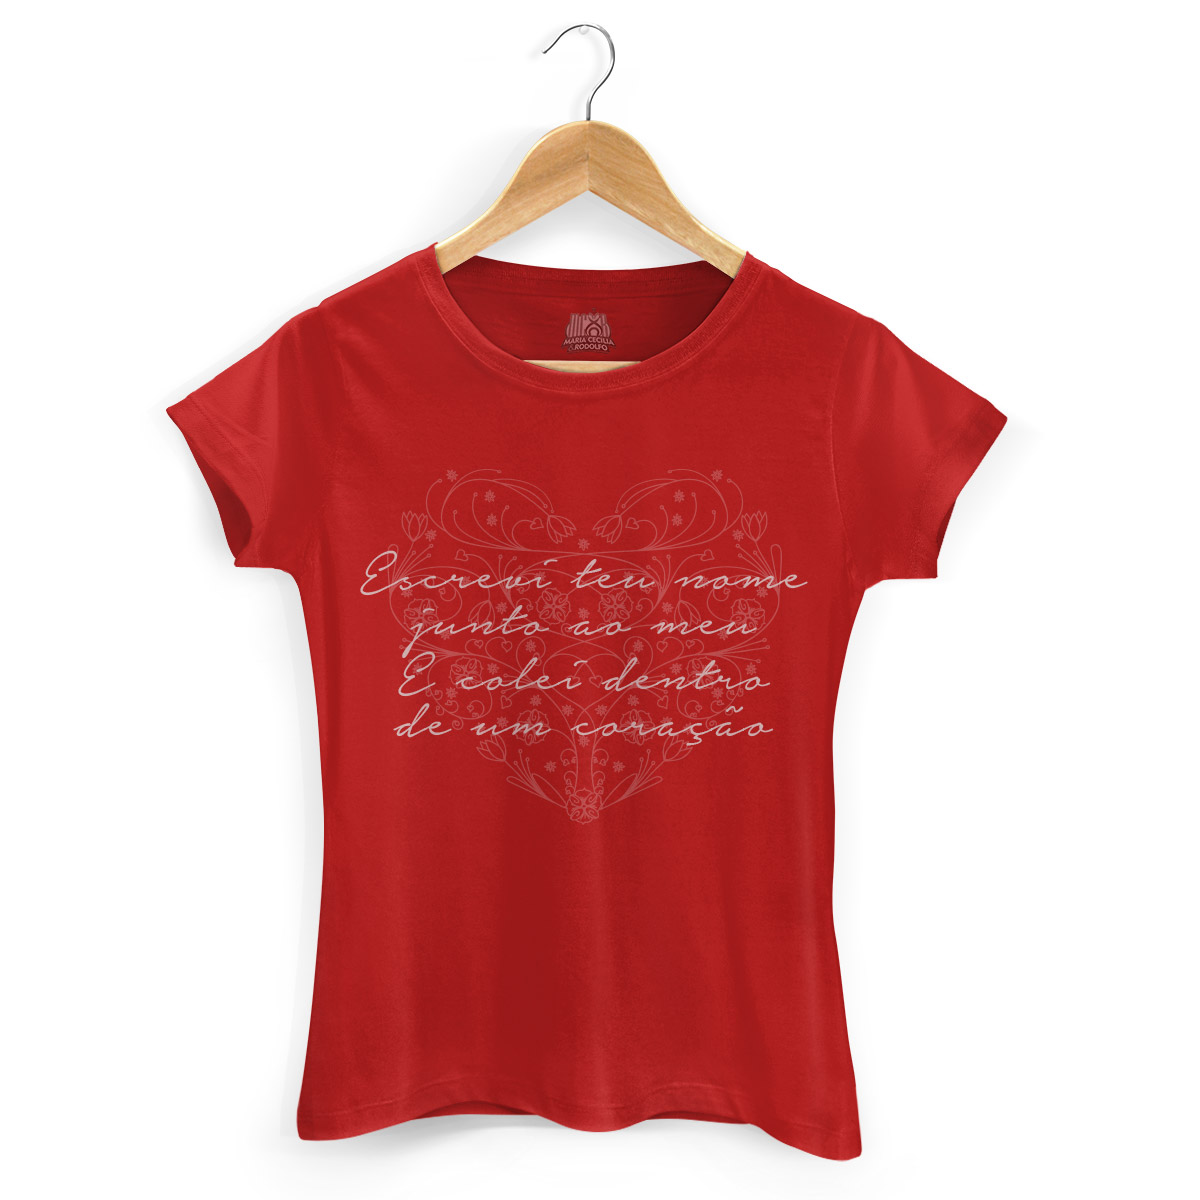 Camiseta Feminina Maria Cecília & Rodolfo Escrevi Teu Nome Red